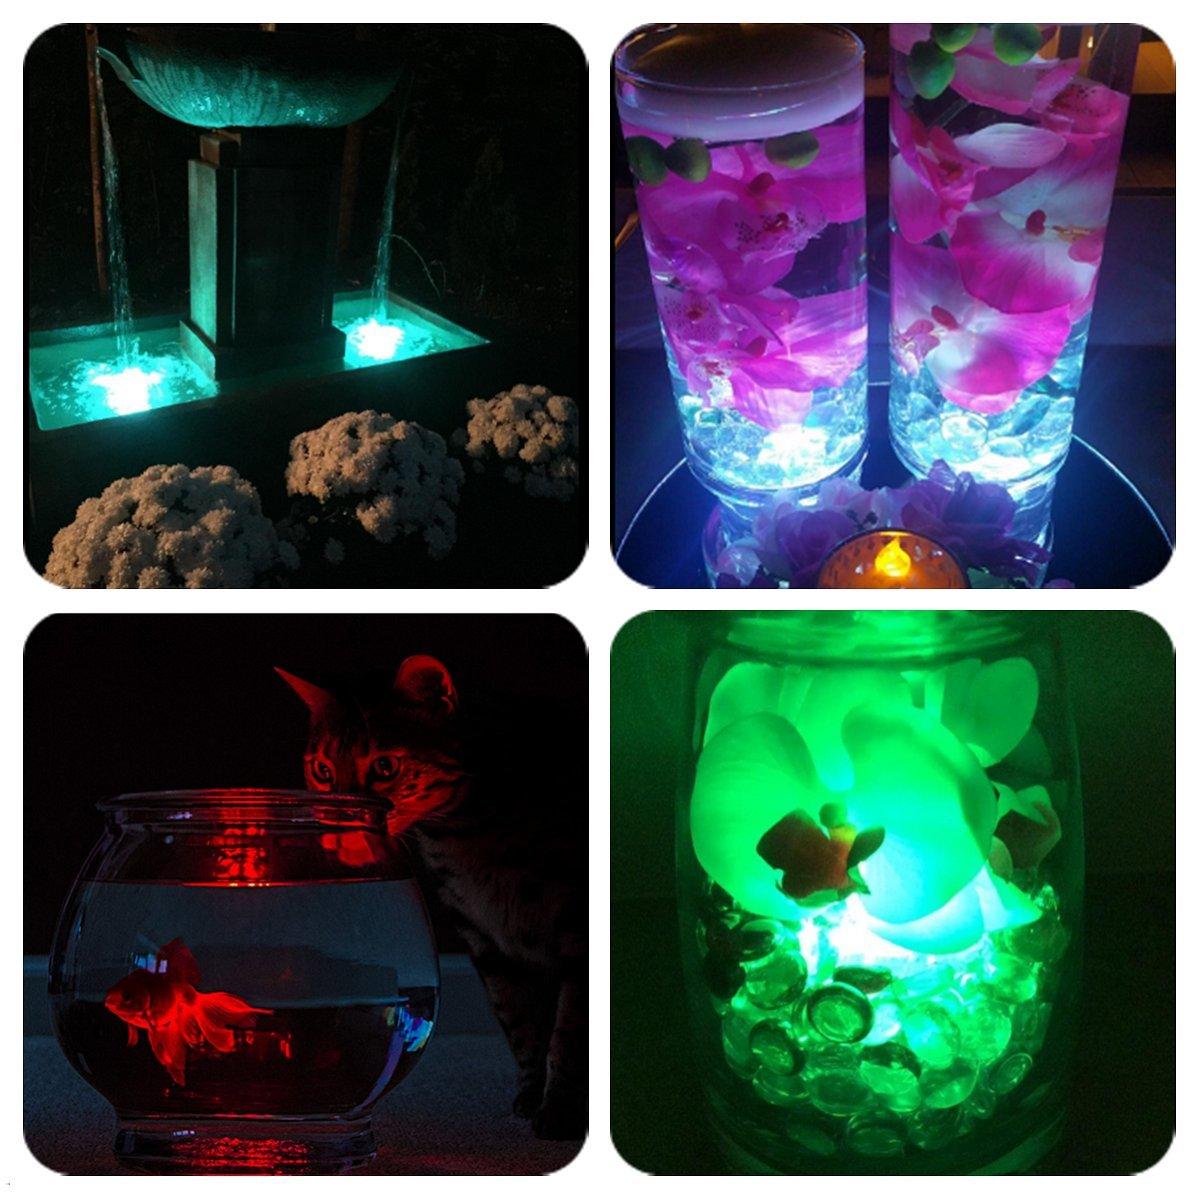 LUXJET RGB Submersible LED Lights Underwater Decor Lighting Color Changing for Aquarium, Pond, Fish Tank, Birdbath, IR Remote Control, Battery Operate, 2 Pack